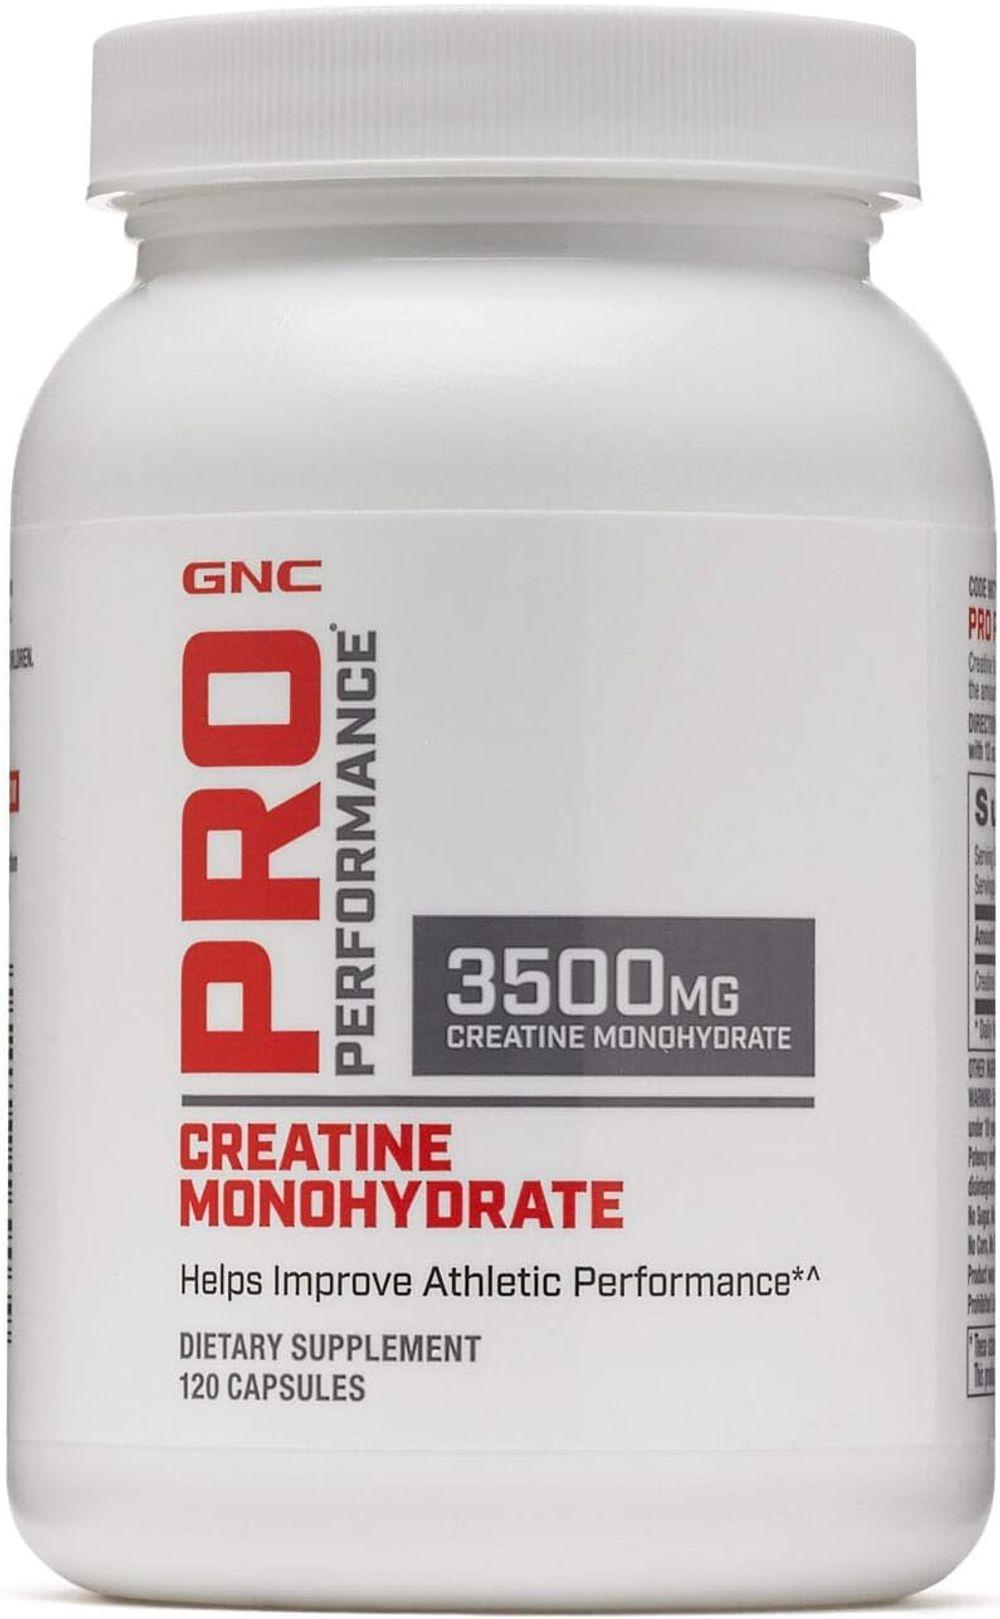 GNC Pro Performance Creatine Monohydrate 3500mg - 120 Capsules, Helps Improve Athletic Performance